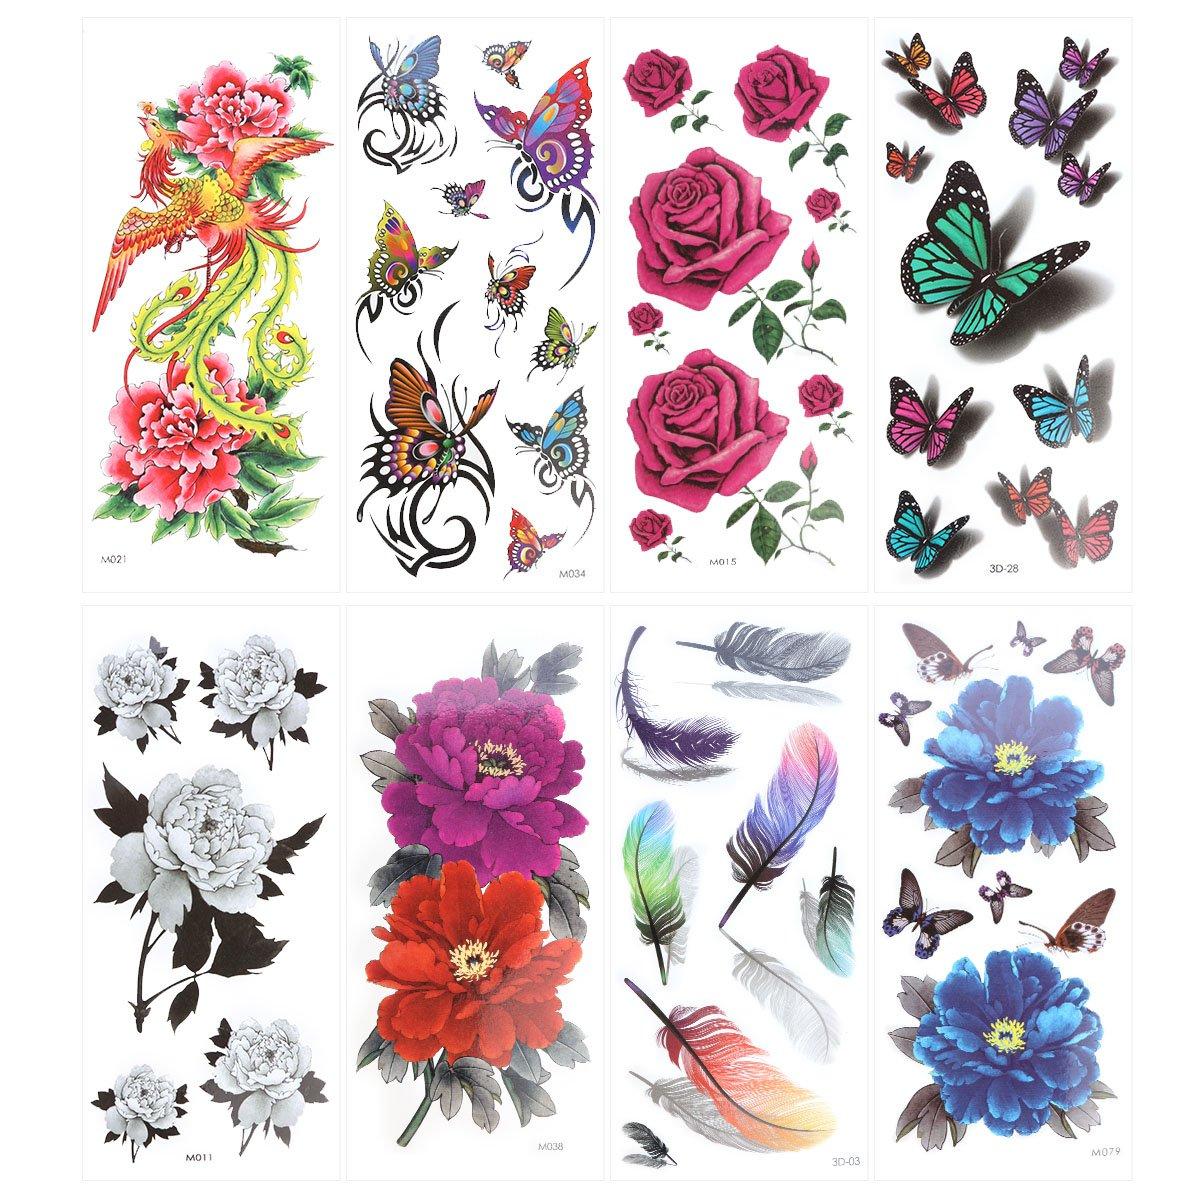 ROSENICE Tatuaje temporal 8 hojas mariposa tatuaje proporciona larga duración para las mujeres